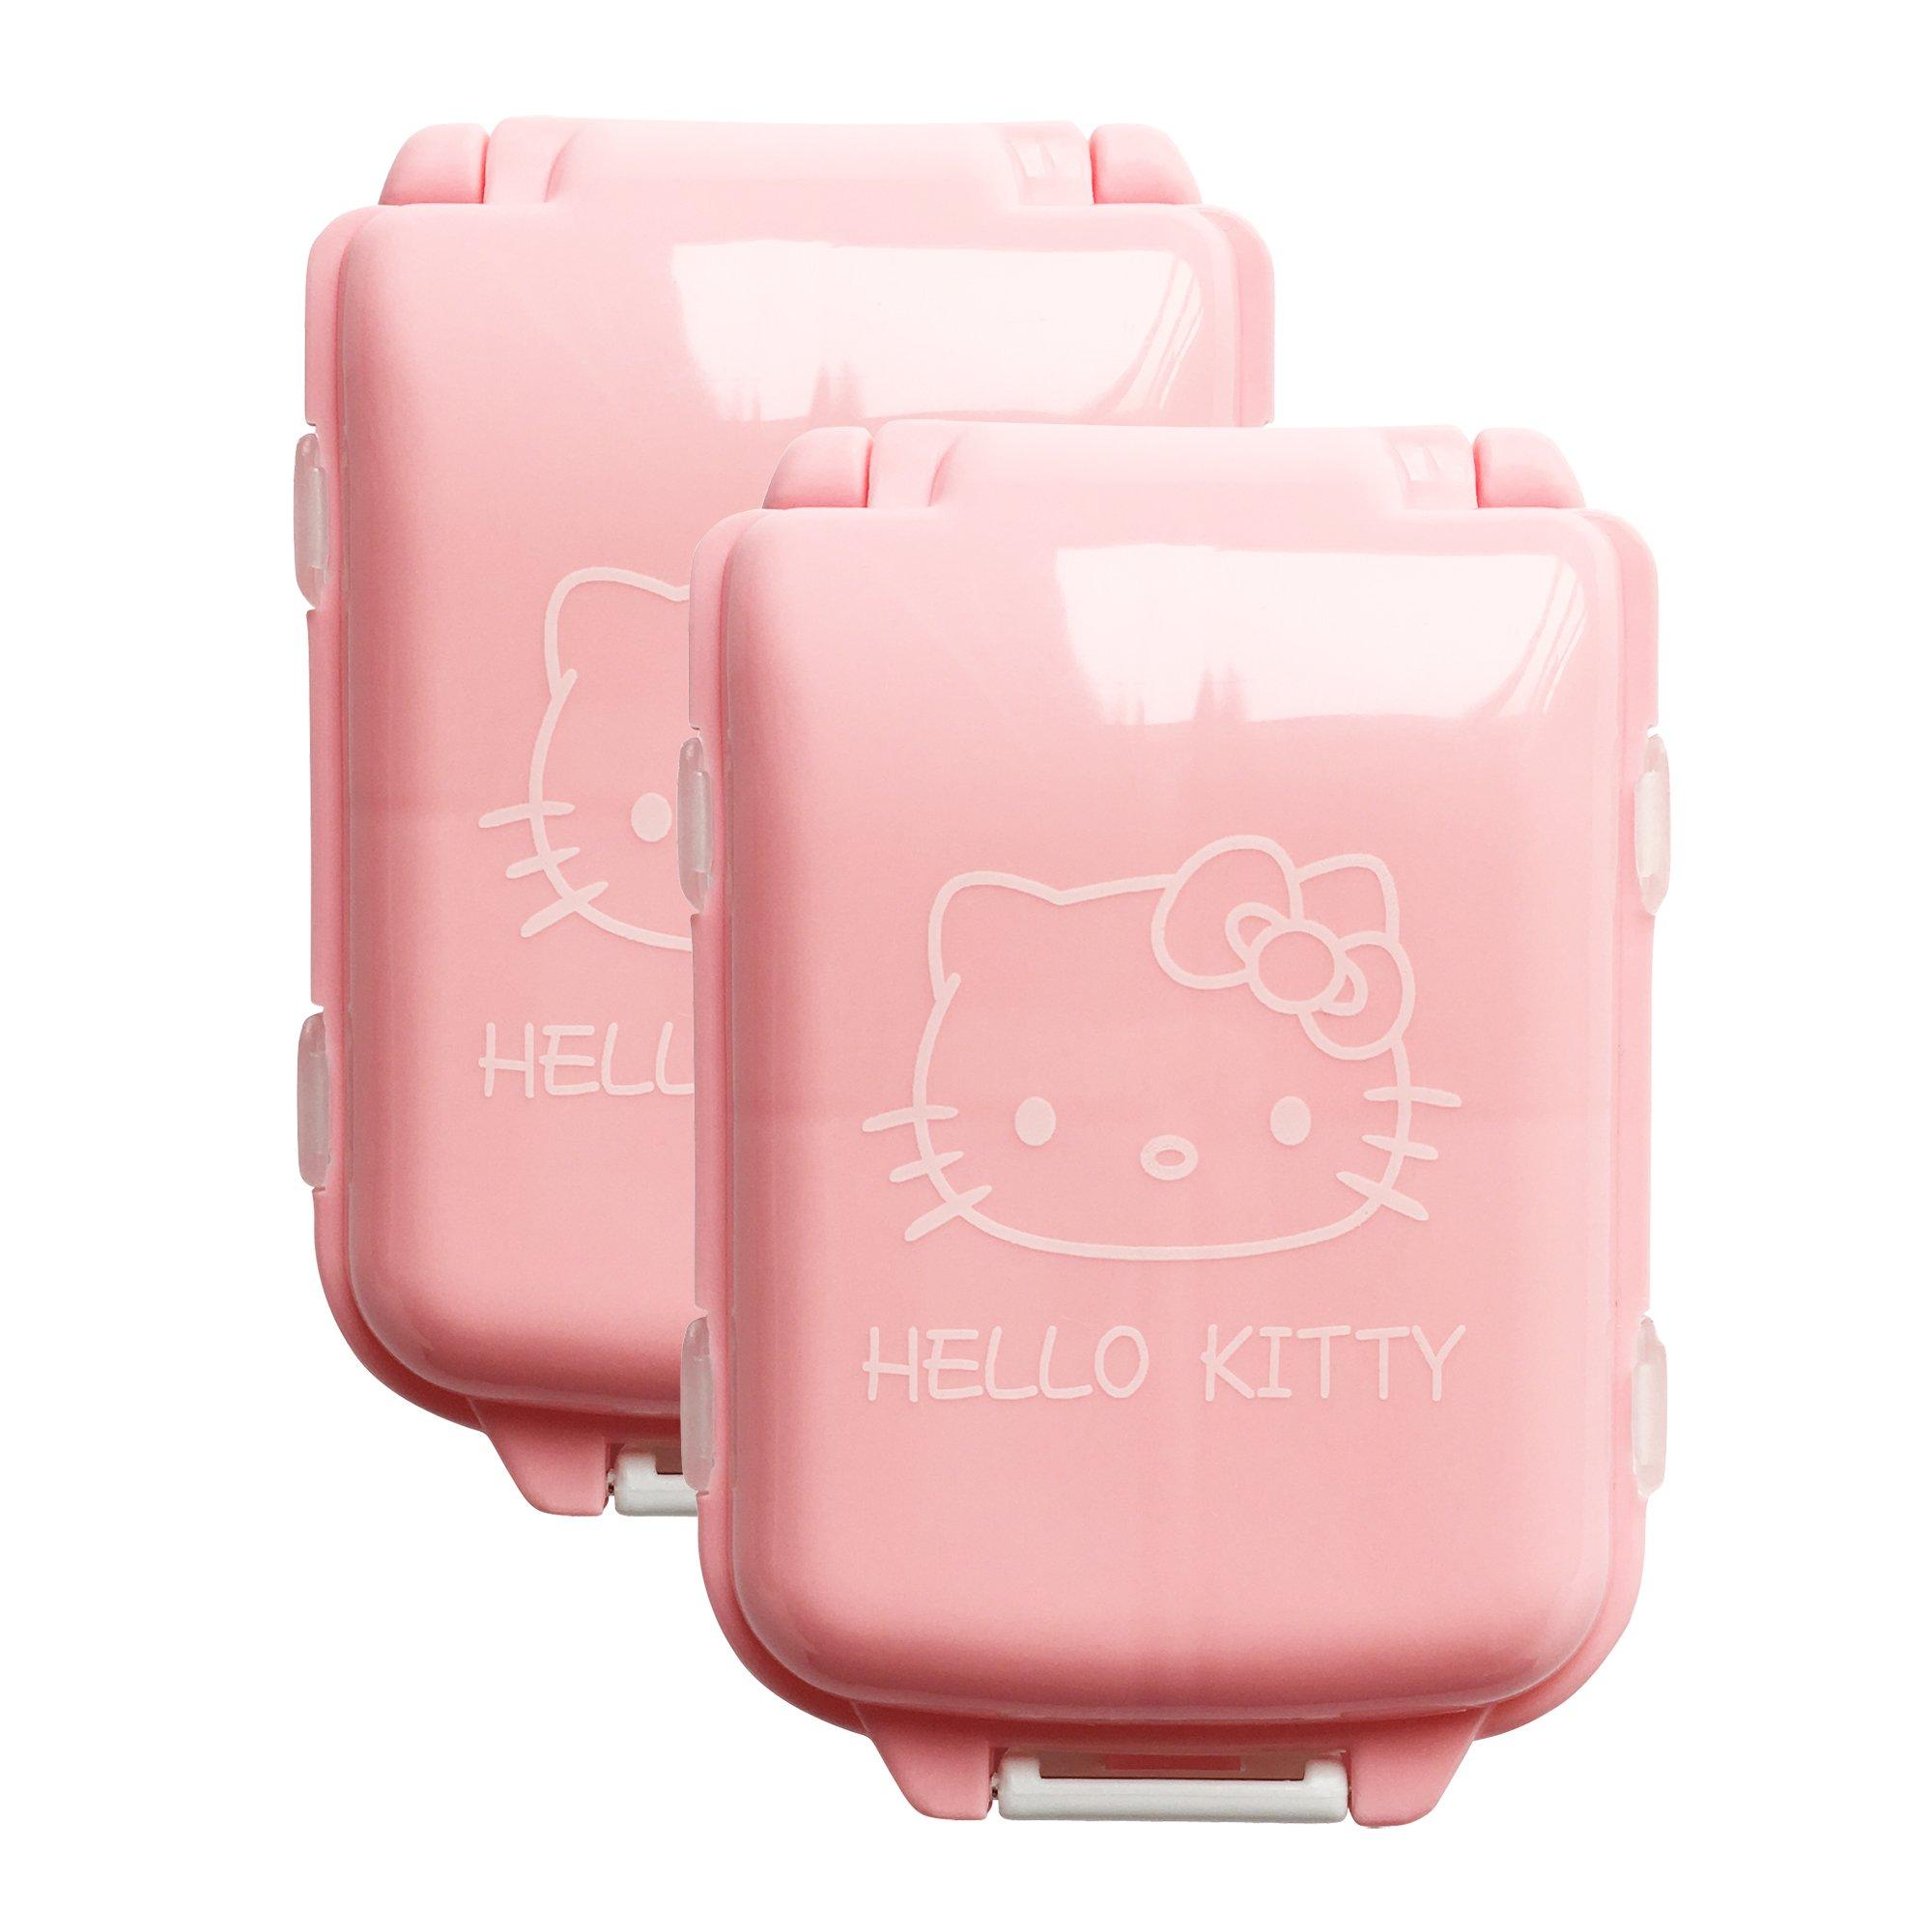 b97412d888 BeneAlways 2 Pcs of Hello Kitty Portable Pill Box Case Holder Organizer  Storage for Medicine Tablet